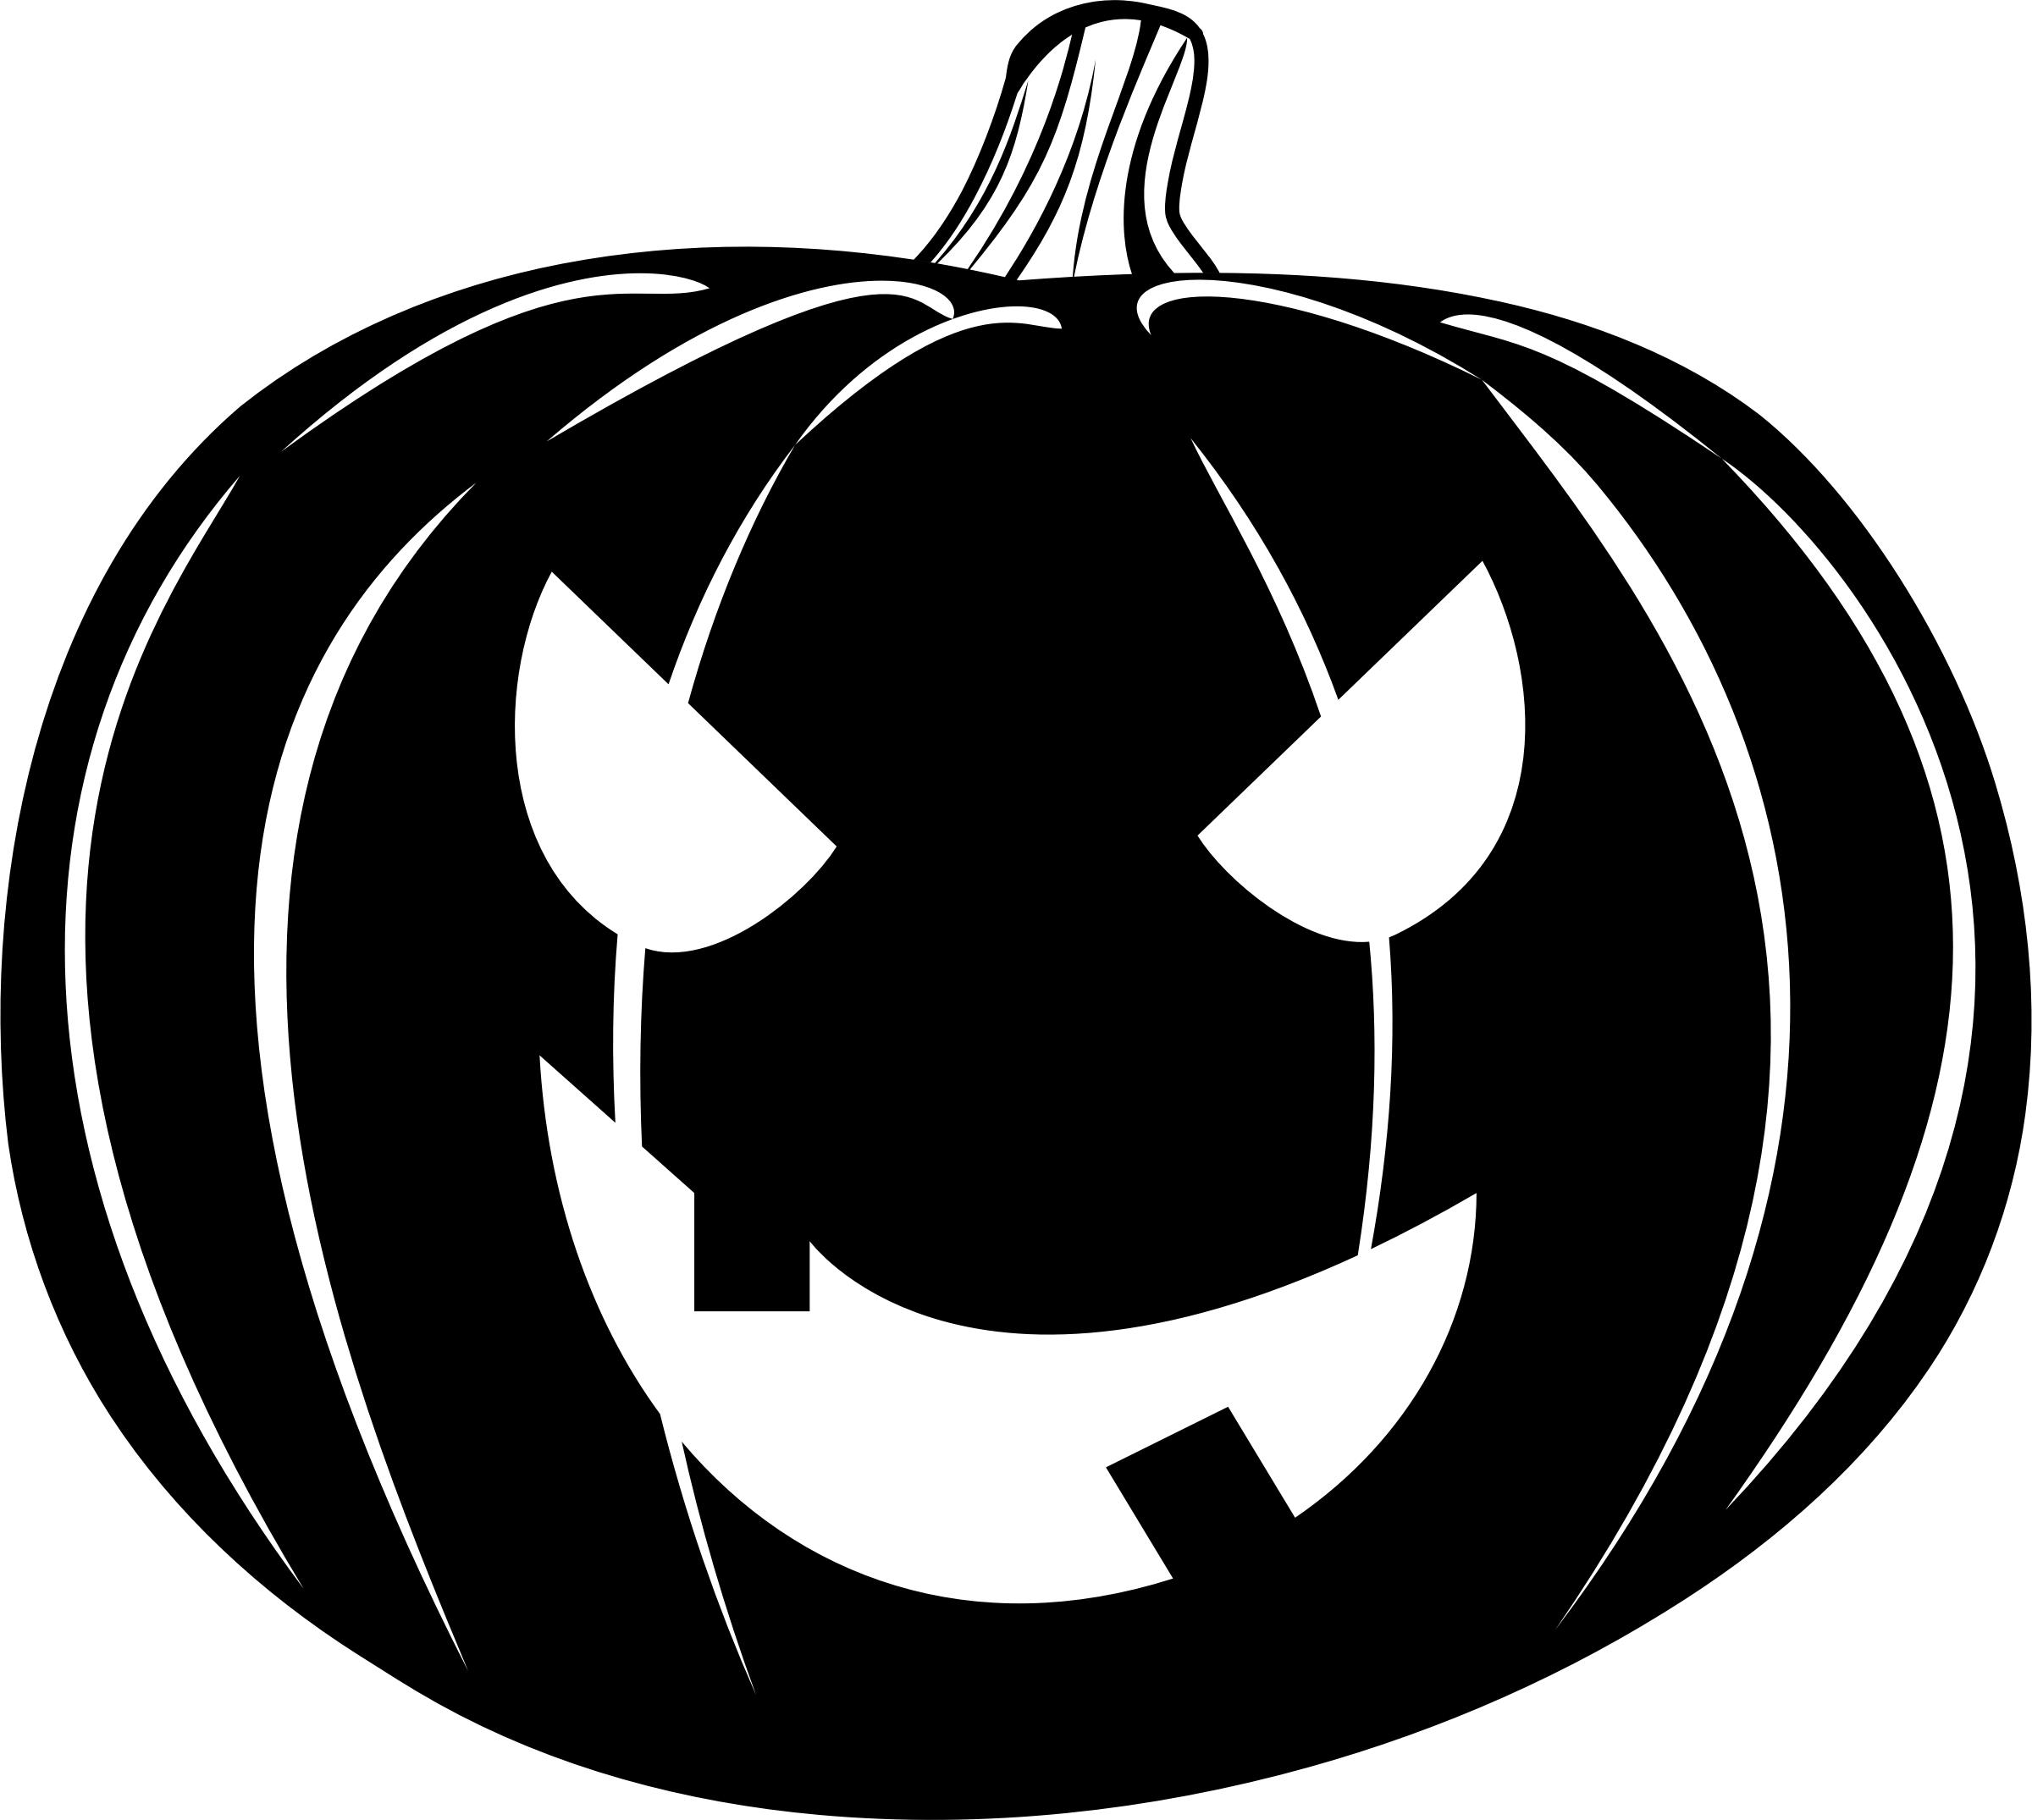 Clipart - Jack-o'-lantern black png